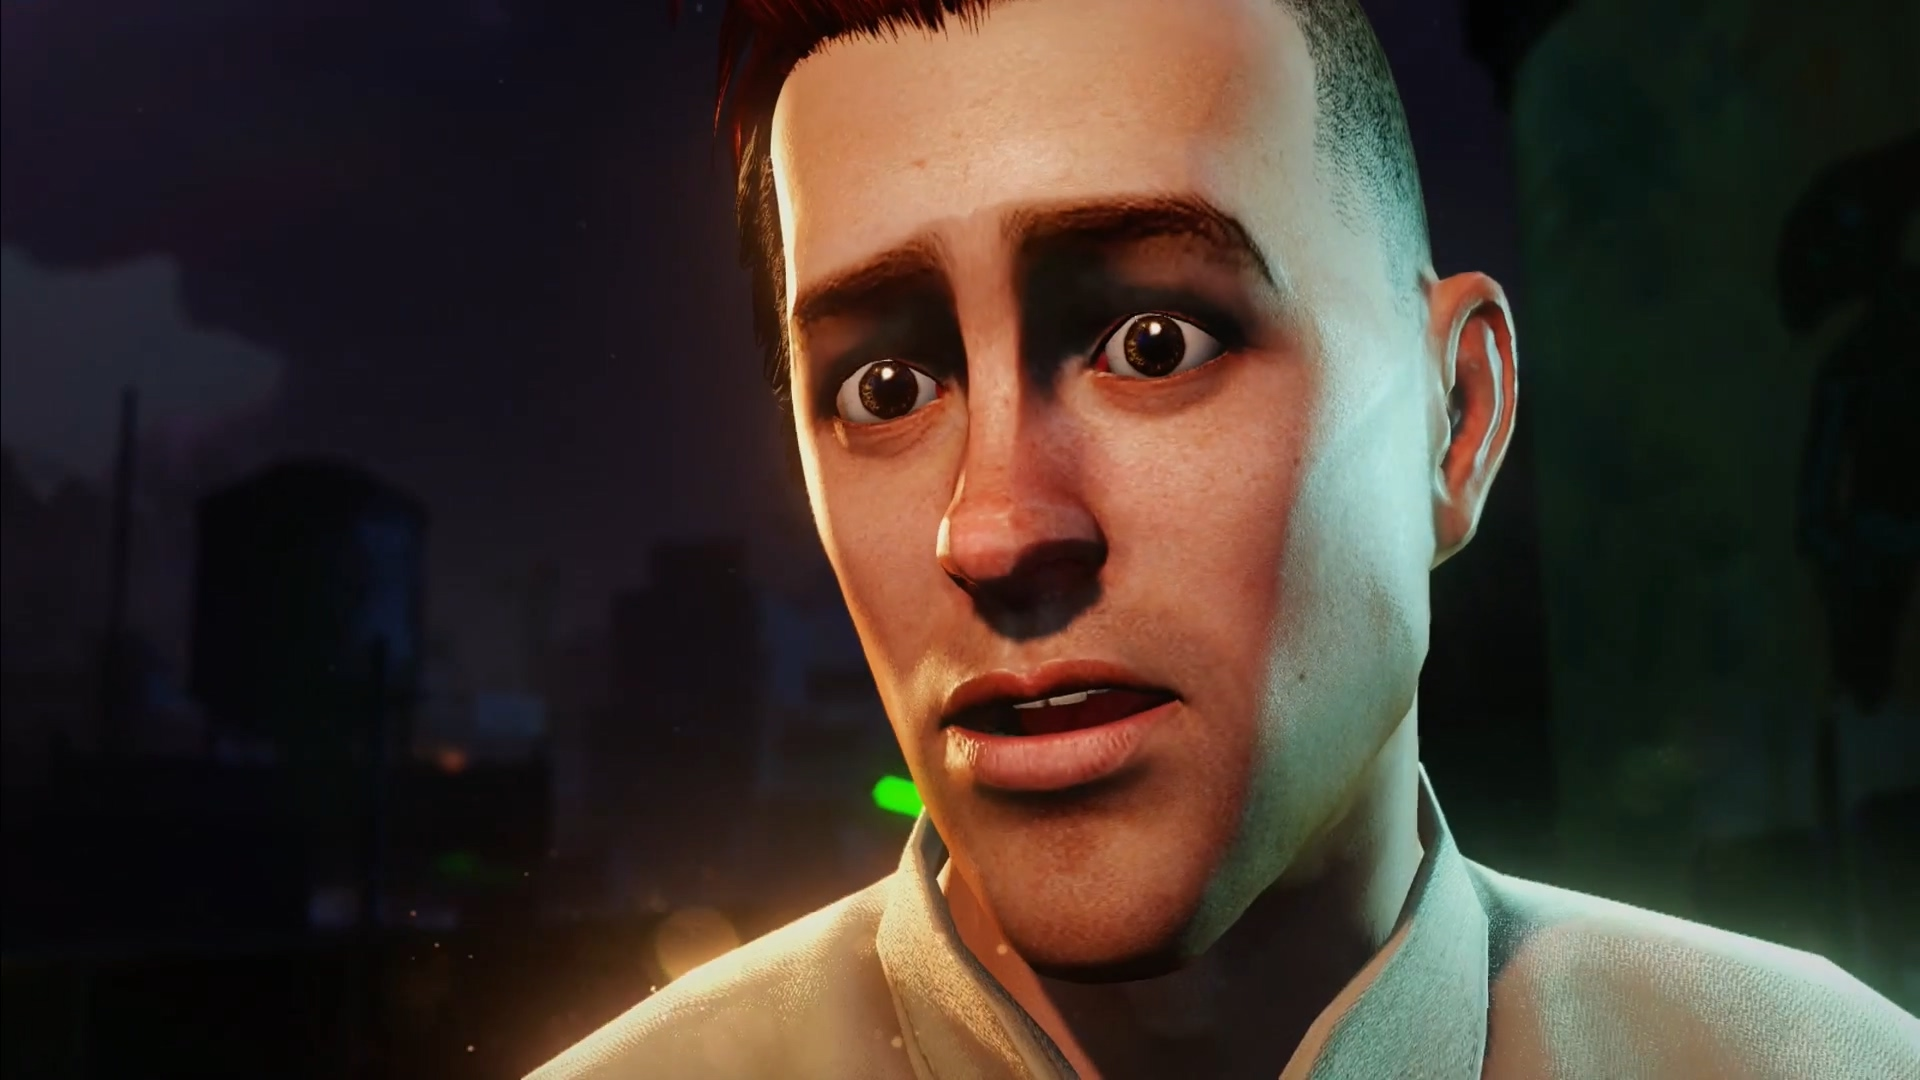 PC版《日落过载》官宣 明天就能开玩